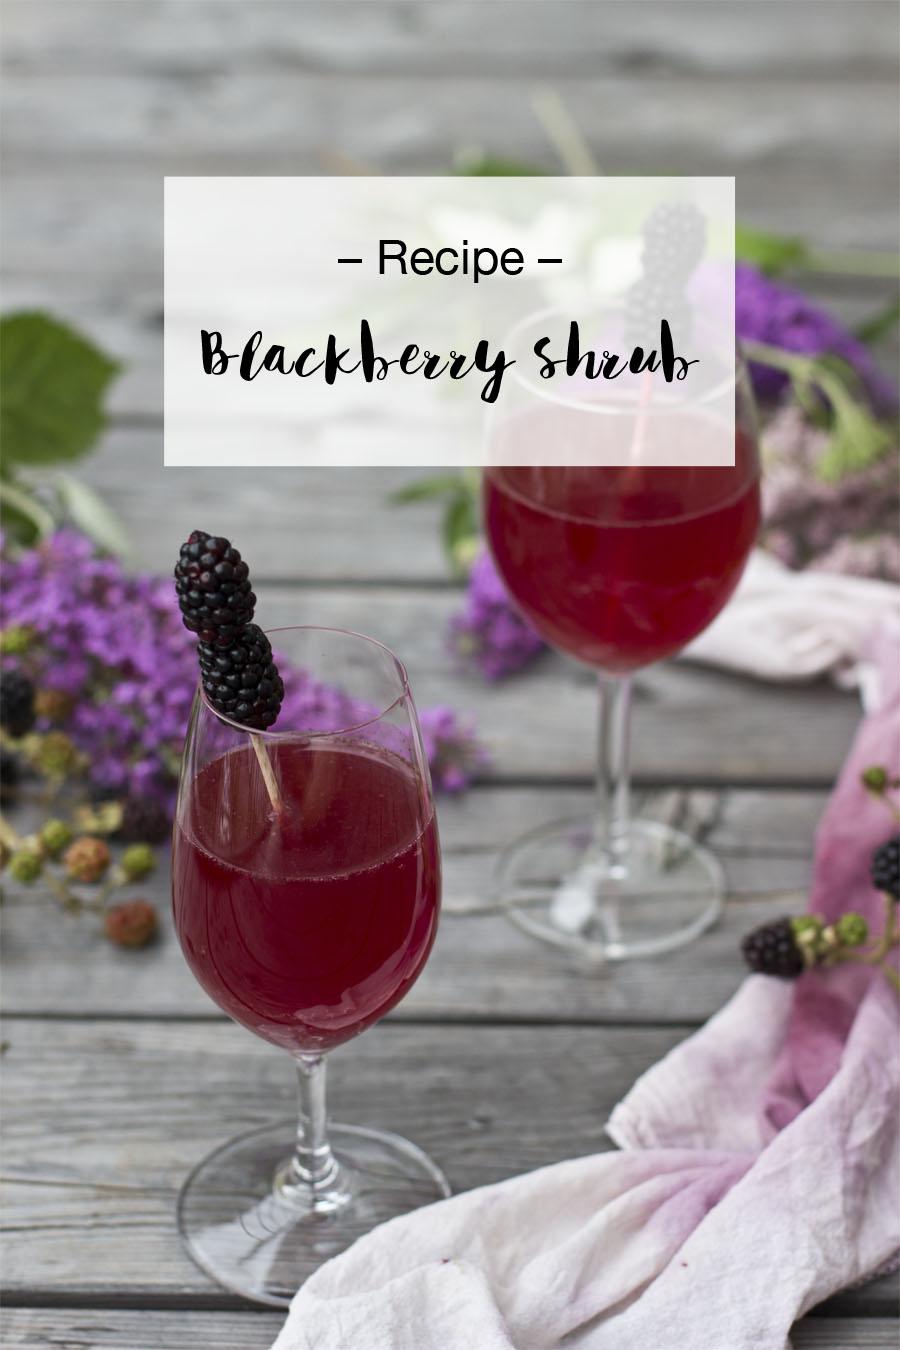 Blackberry shrub recipe   LOOK WHAT I MADE ...